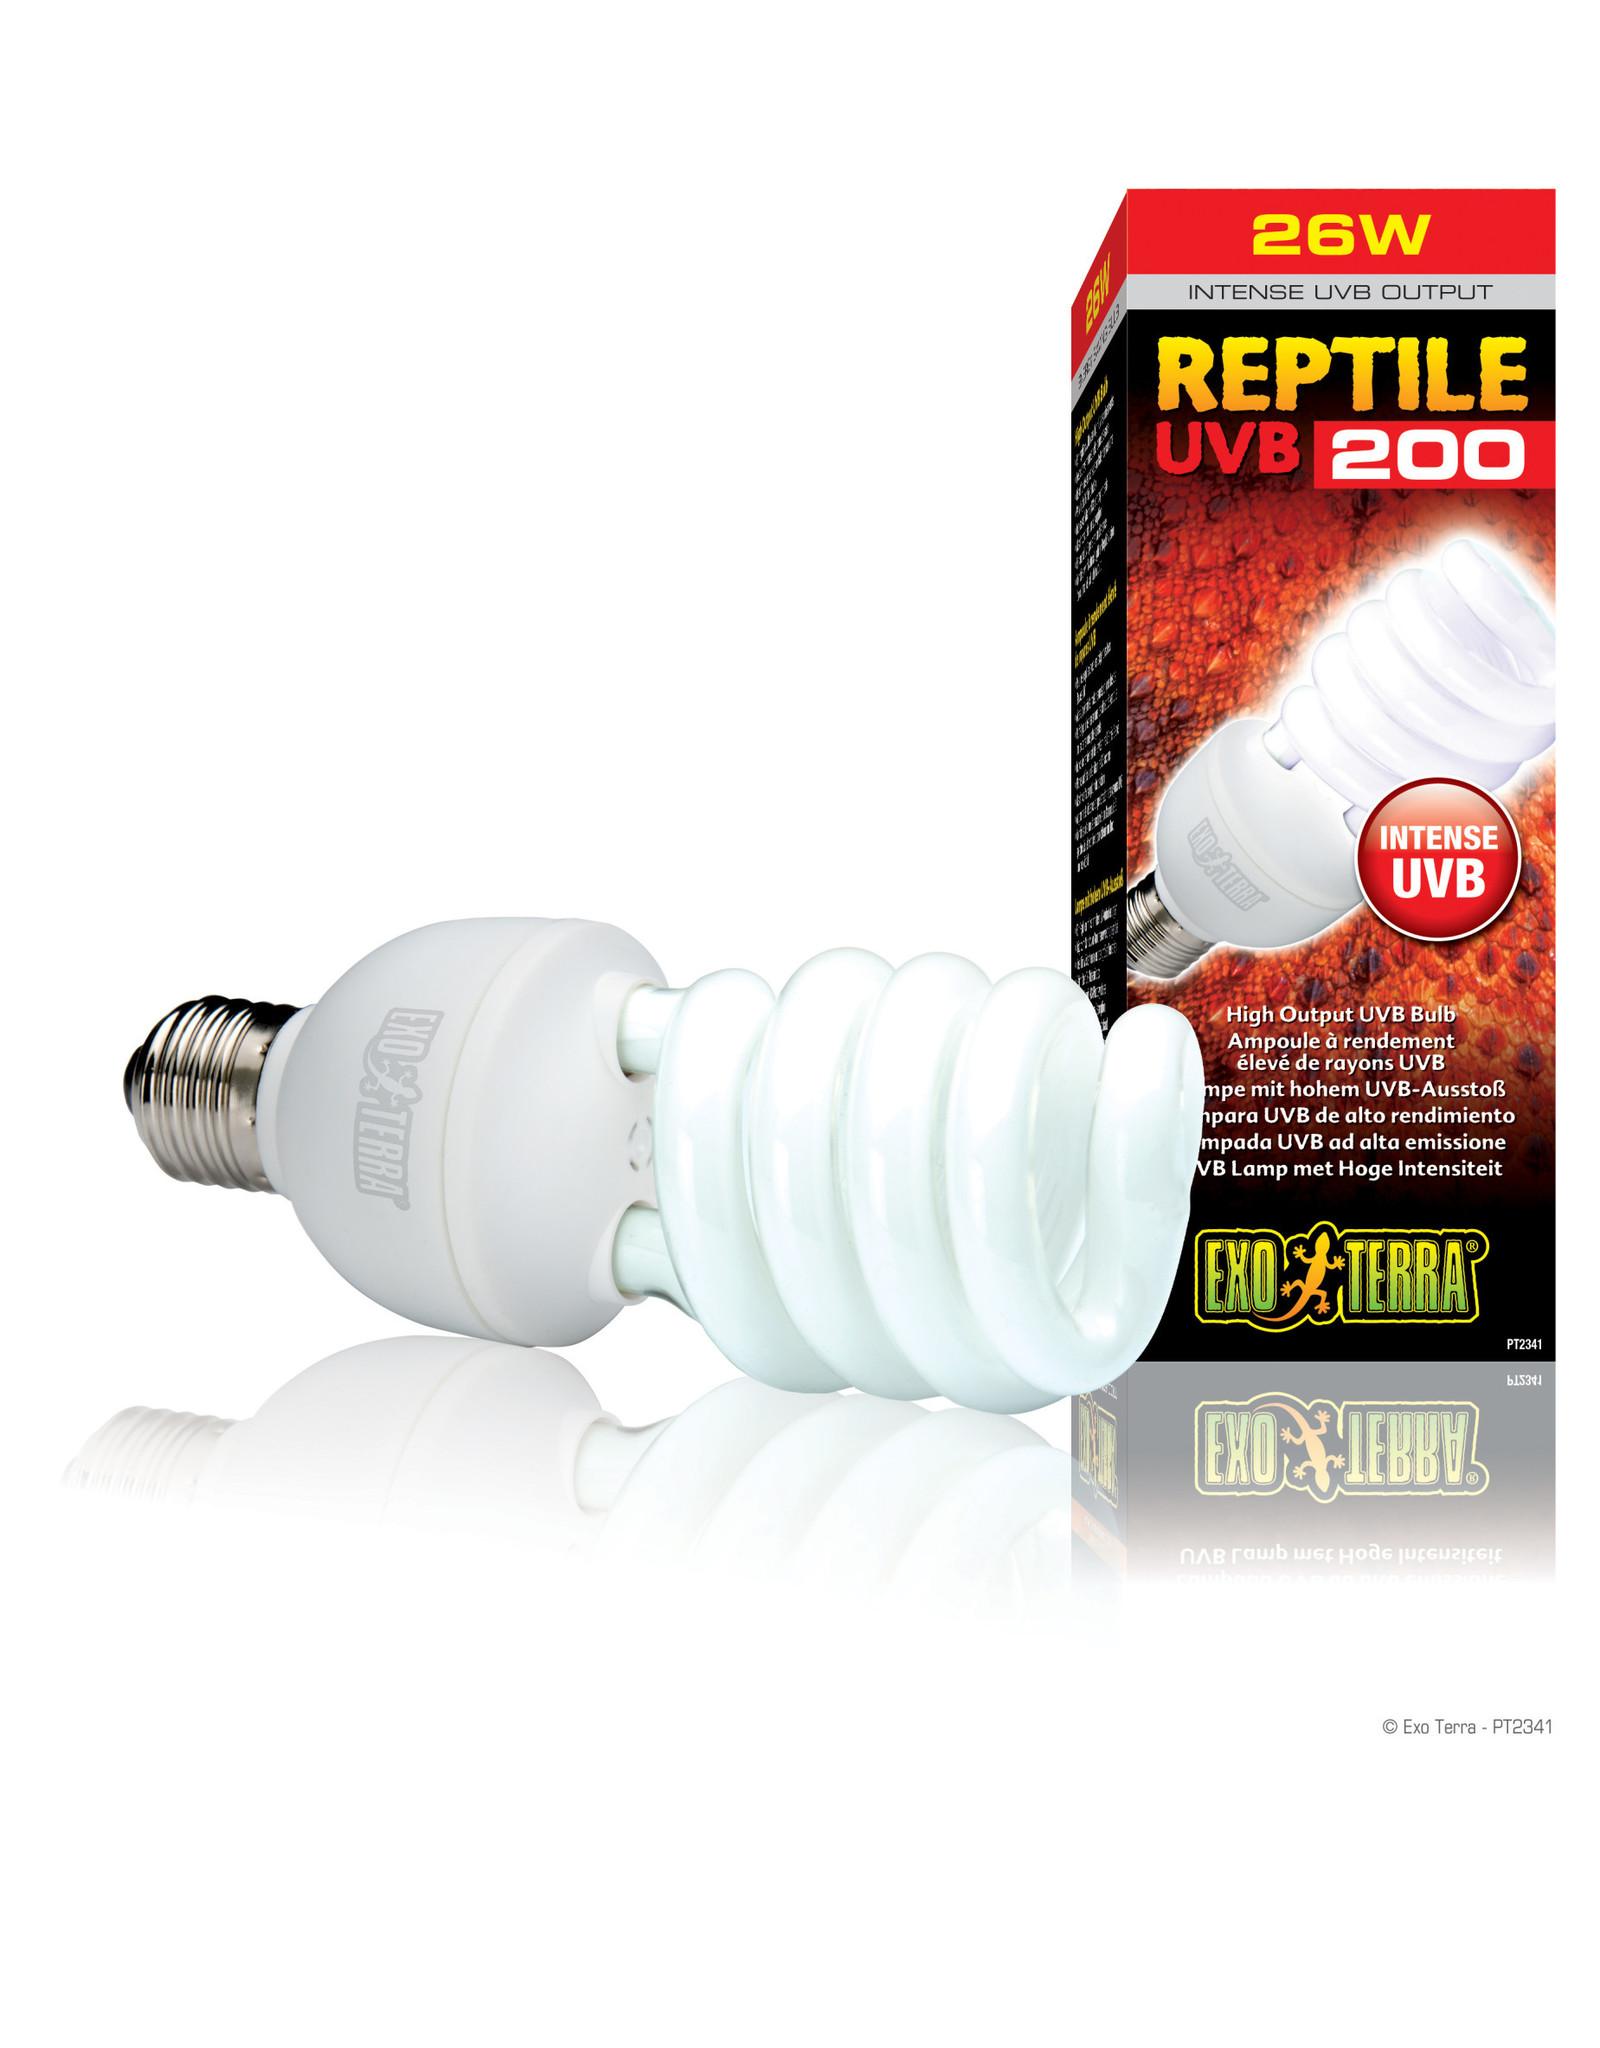 Exo Terra Reptile UVB200 High Output UVB Bulb - 26 W